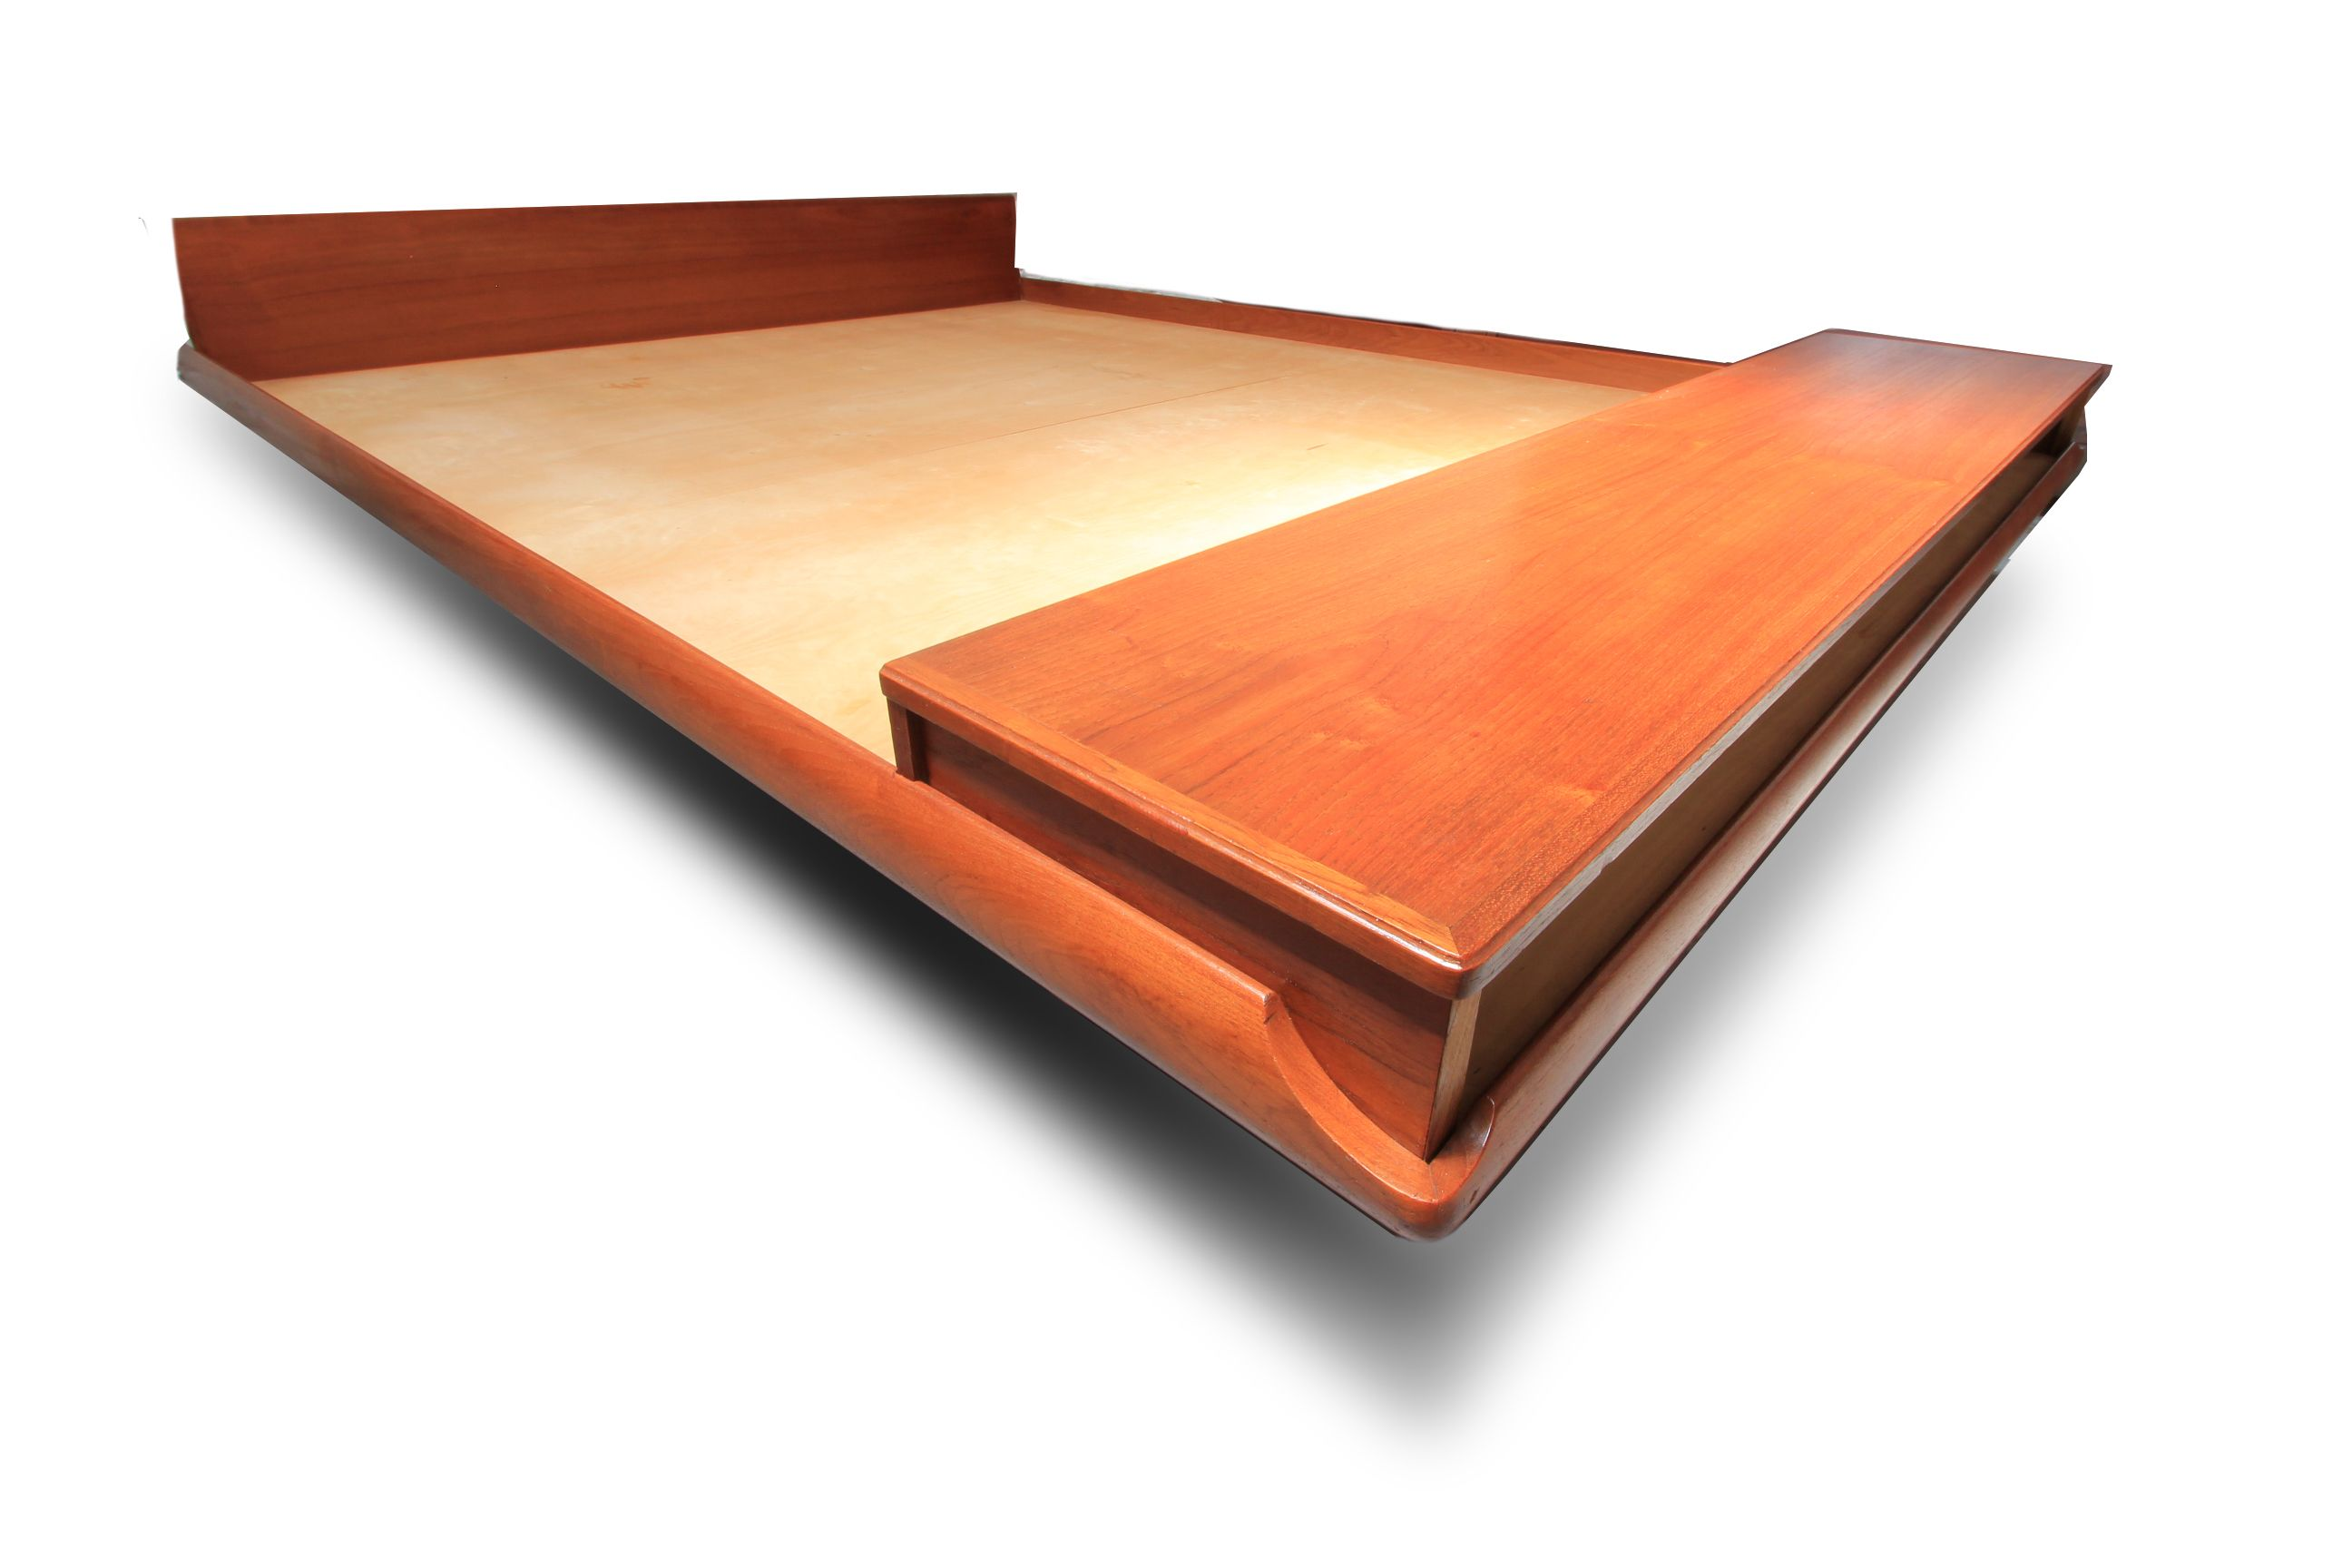 DANISH MODERN DESIGNER TEAK KING PLATFORM BED WITH STORAGE at www ...